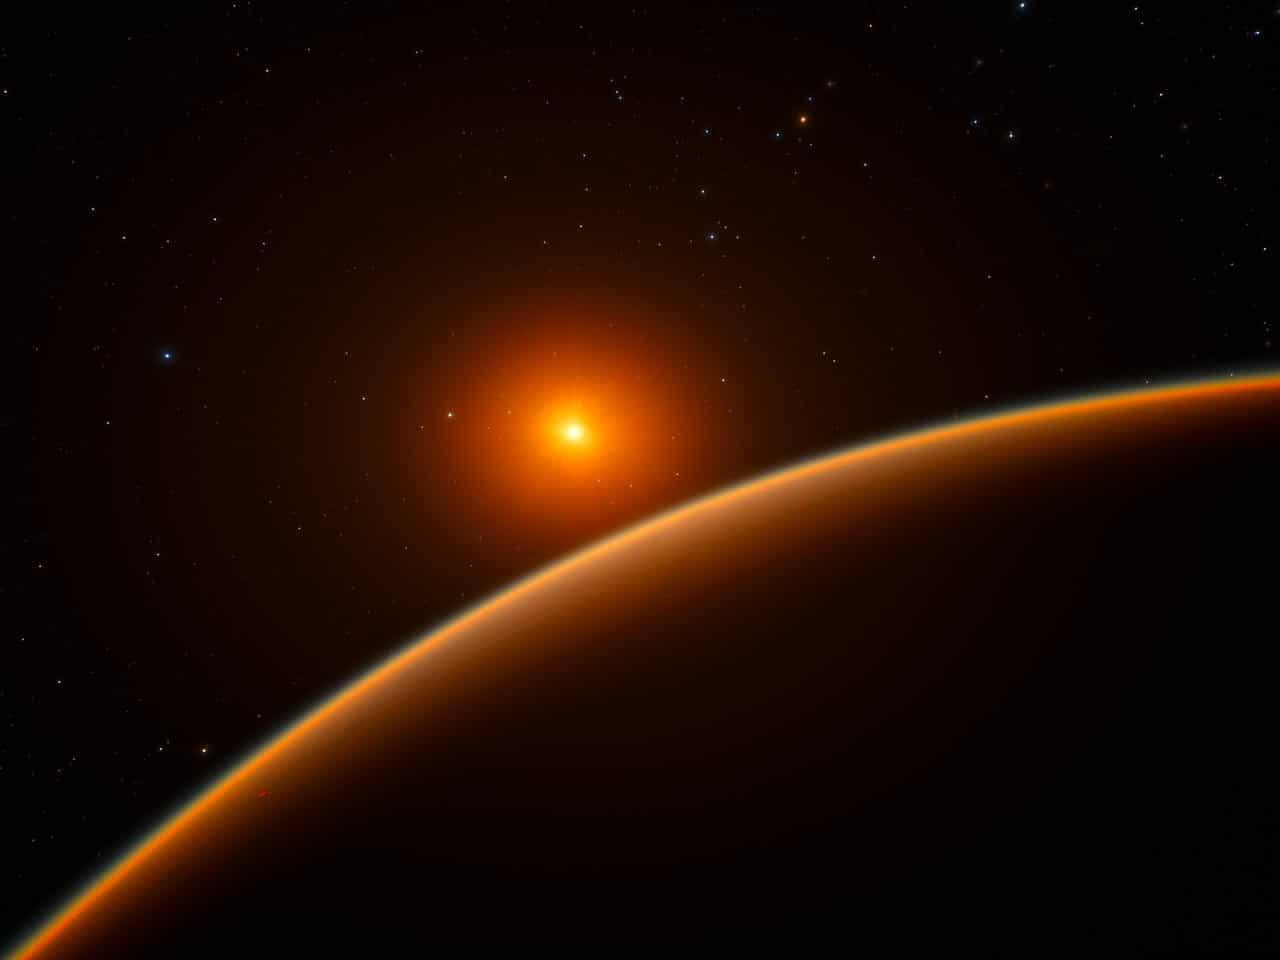 LHS 1140b, un gran candidato para la búsqueda de vida